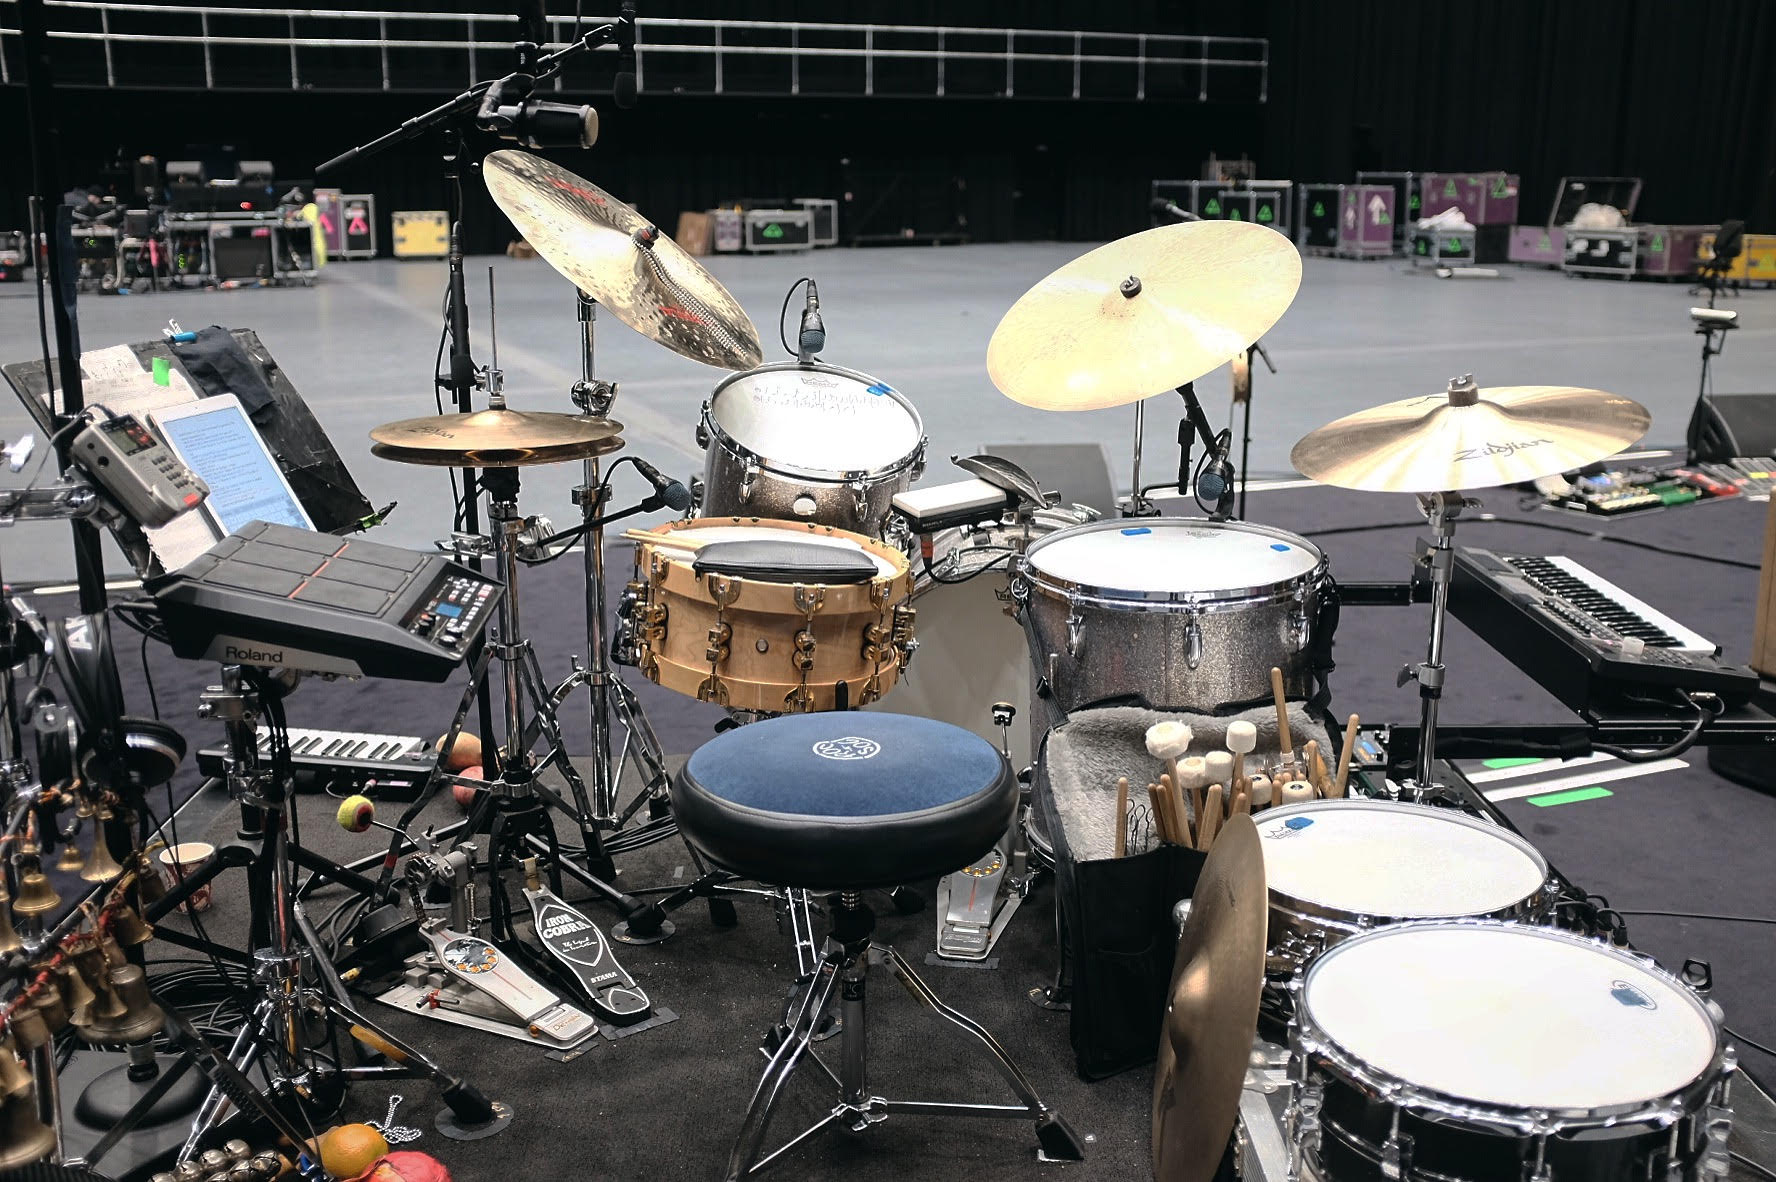 Radiohead rehearsals 2017, Clive Deamer kit.